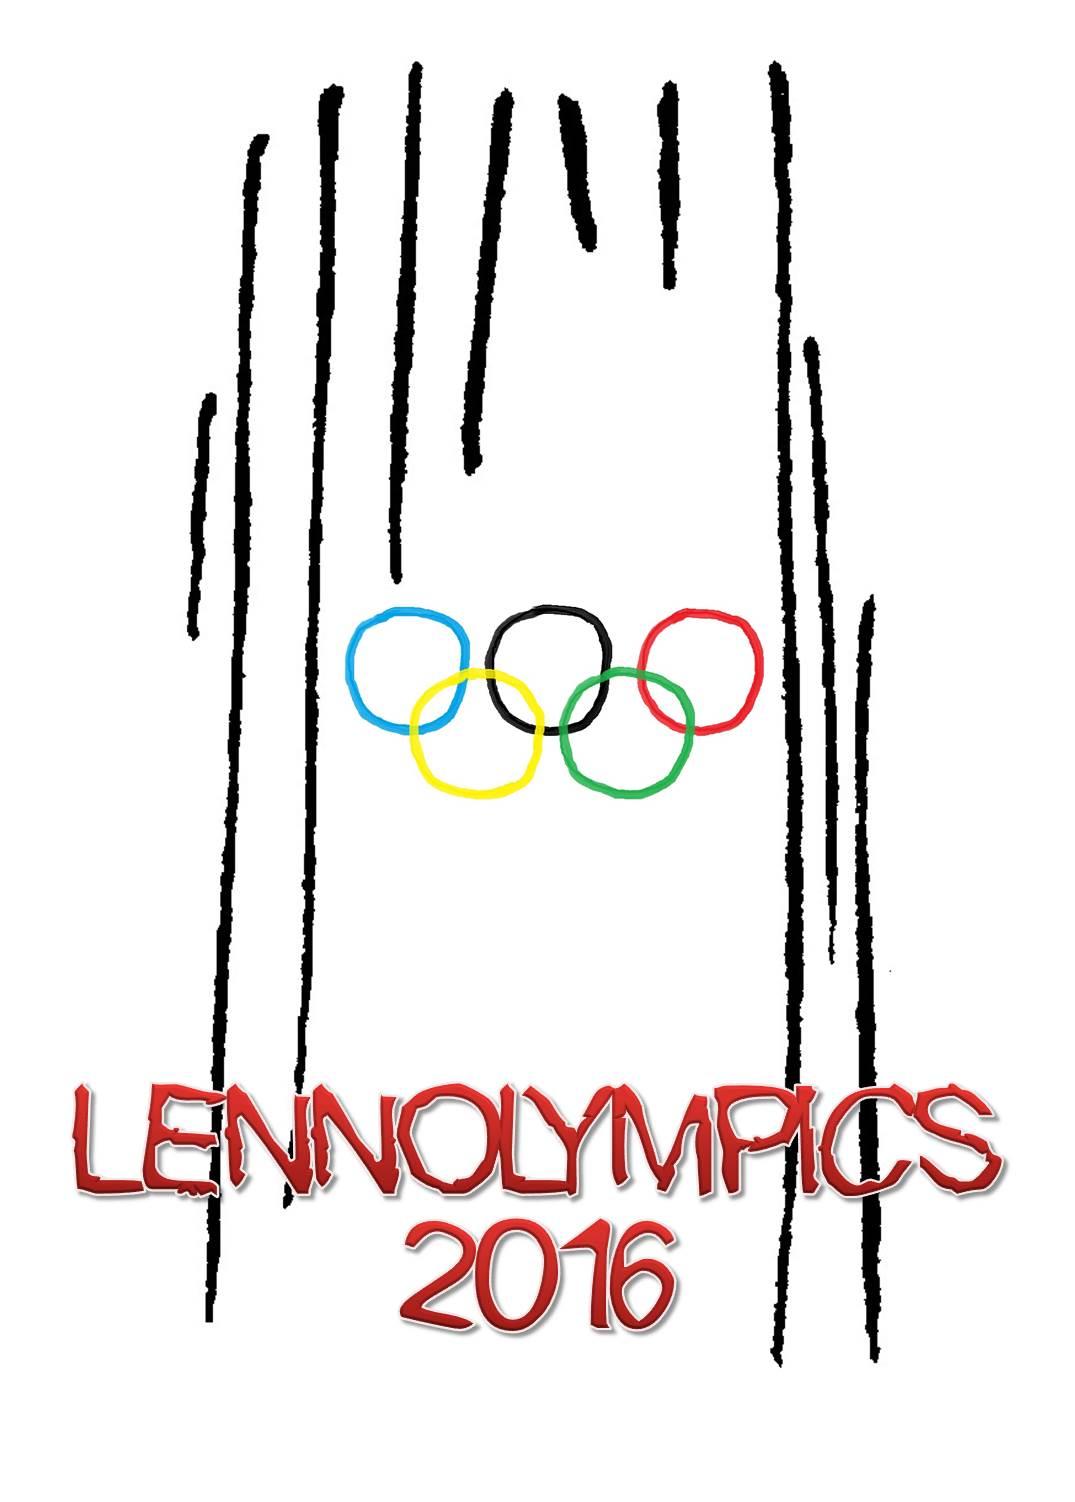 LENNOLYMPICS 2016